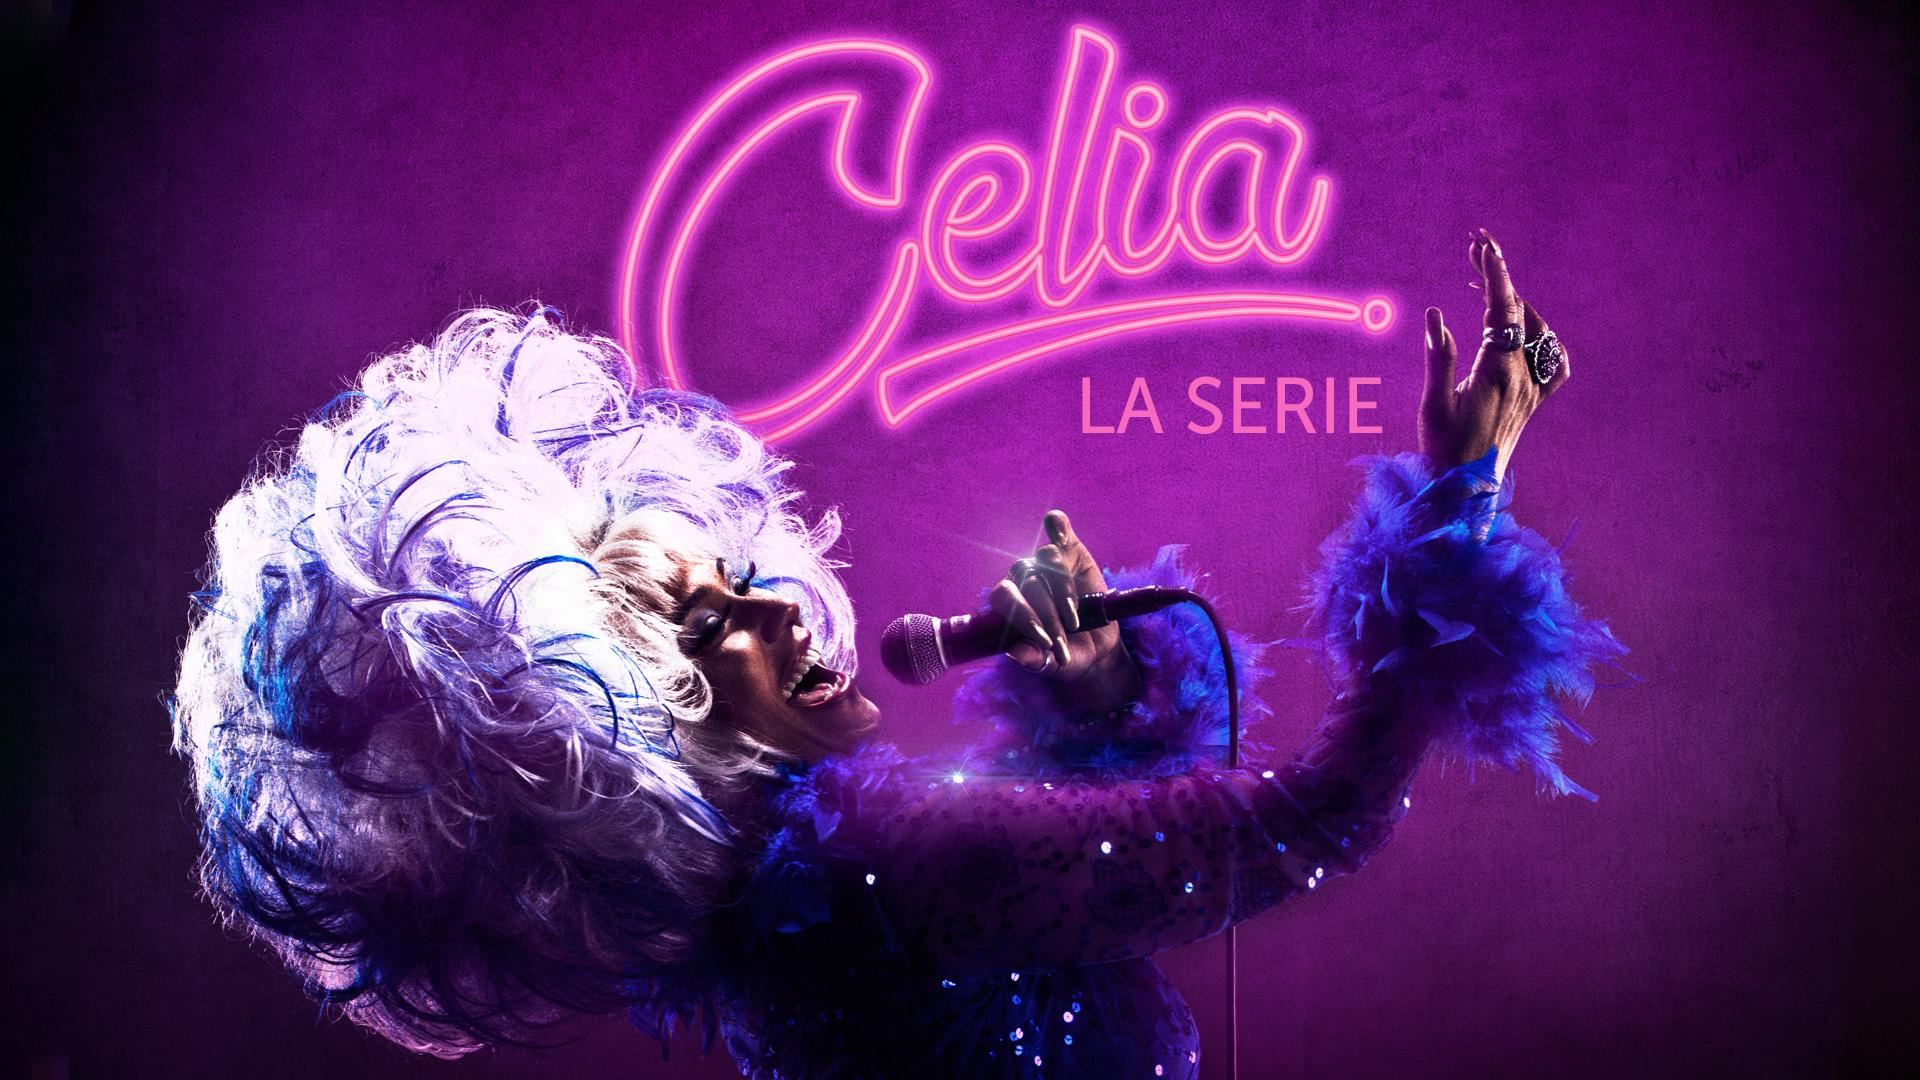 My Celia Cruz Addiction